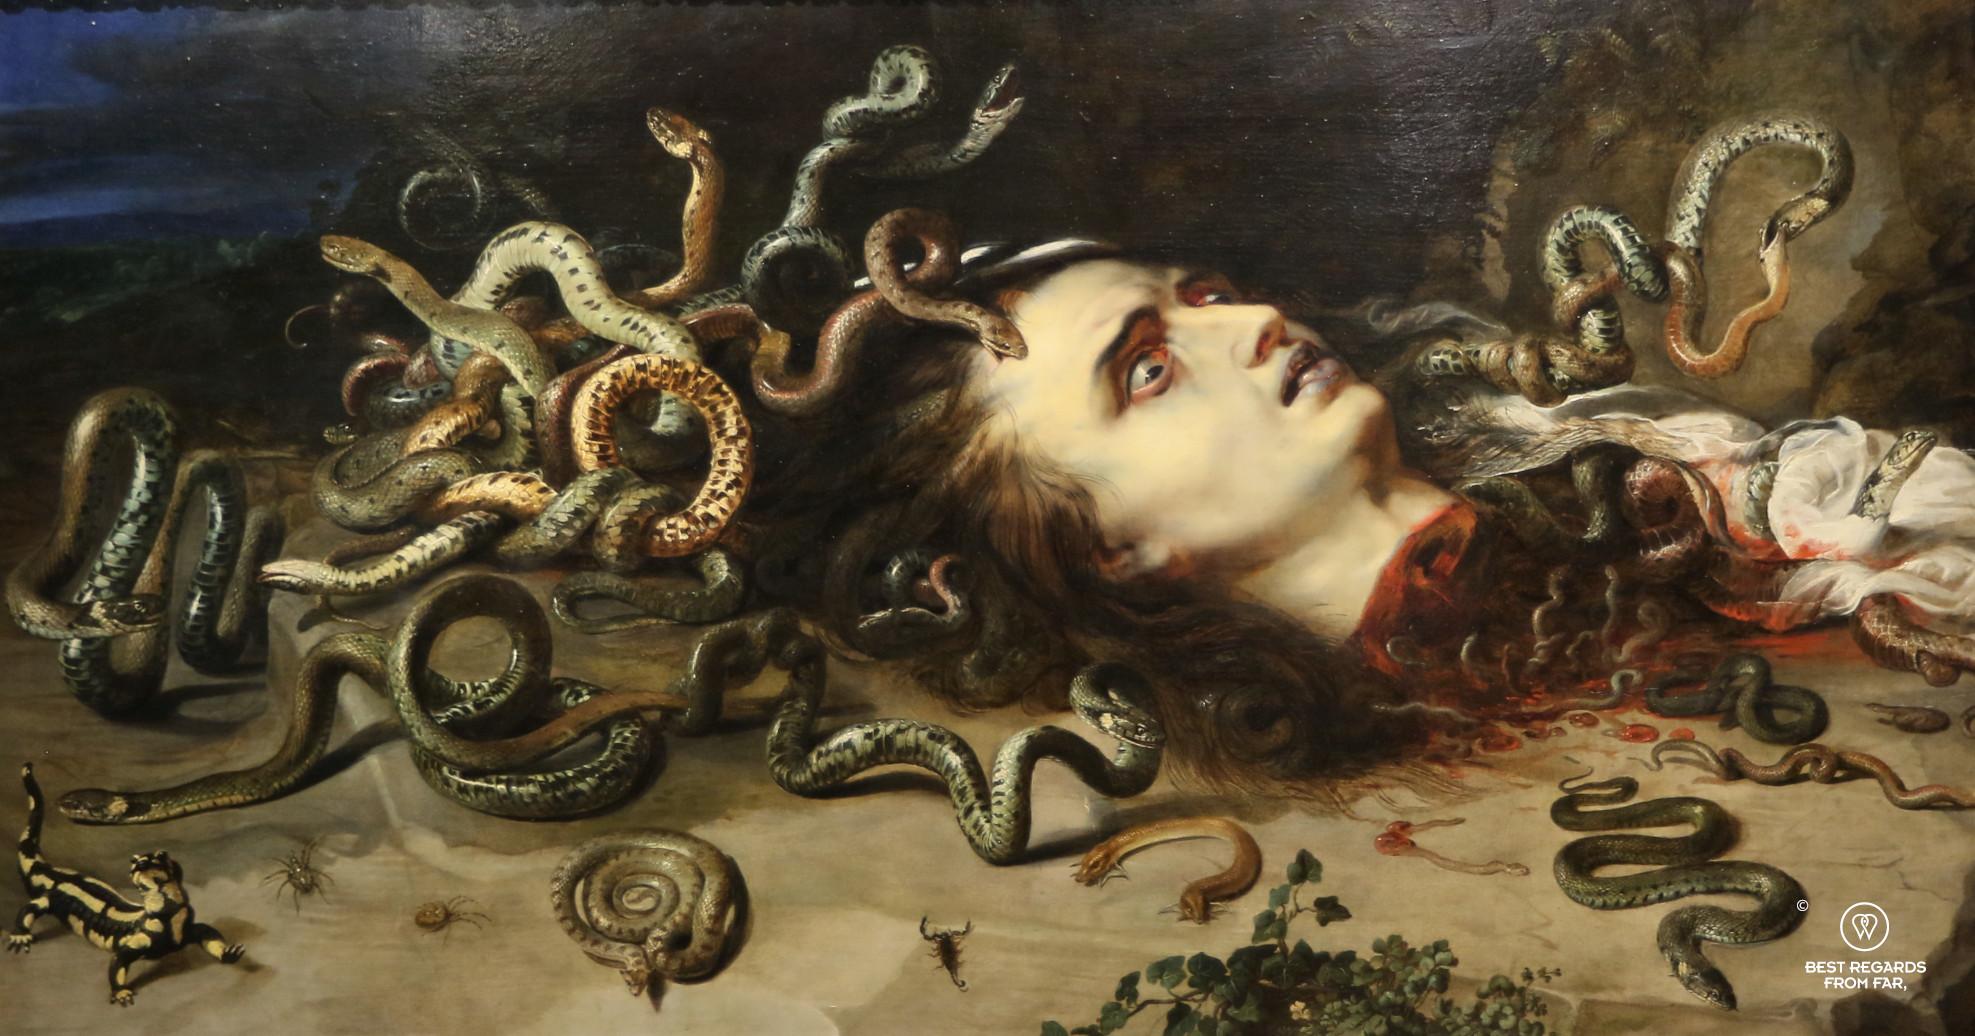 Head of Medusa by Rubens (1618), De Young Museum Legion of Honor, San Francisco